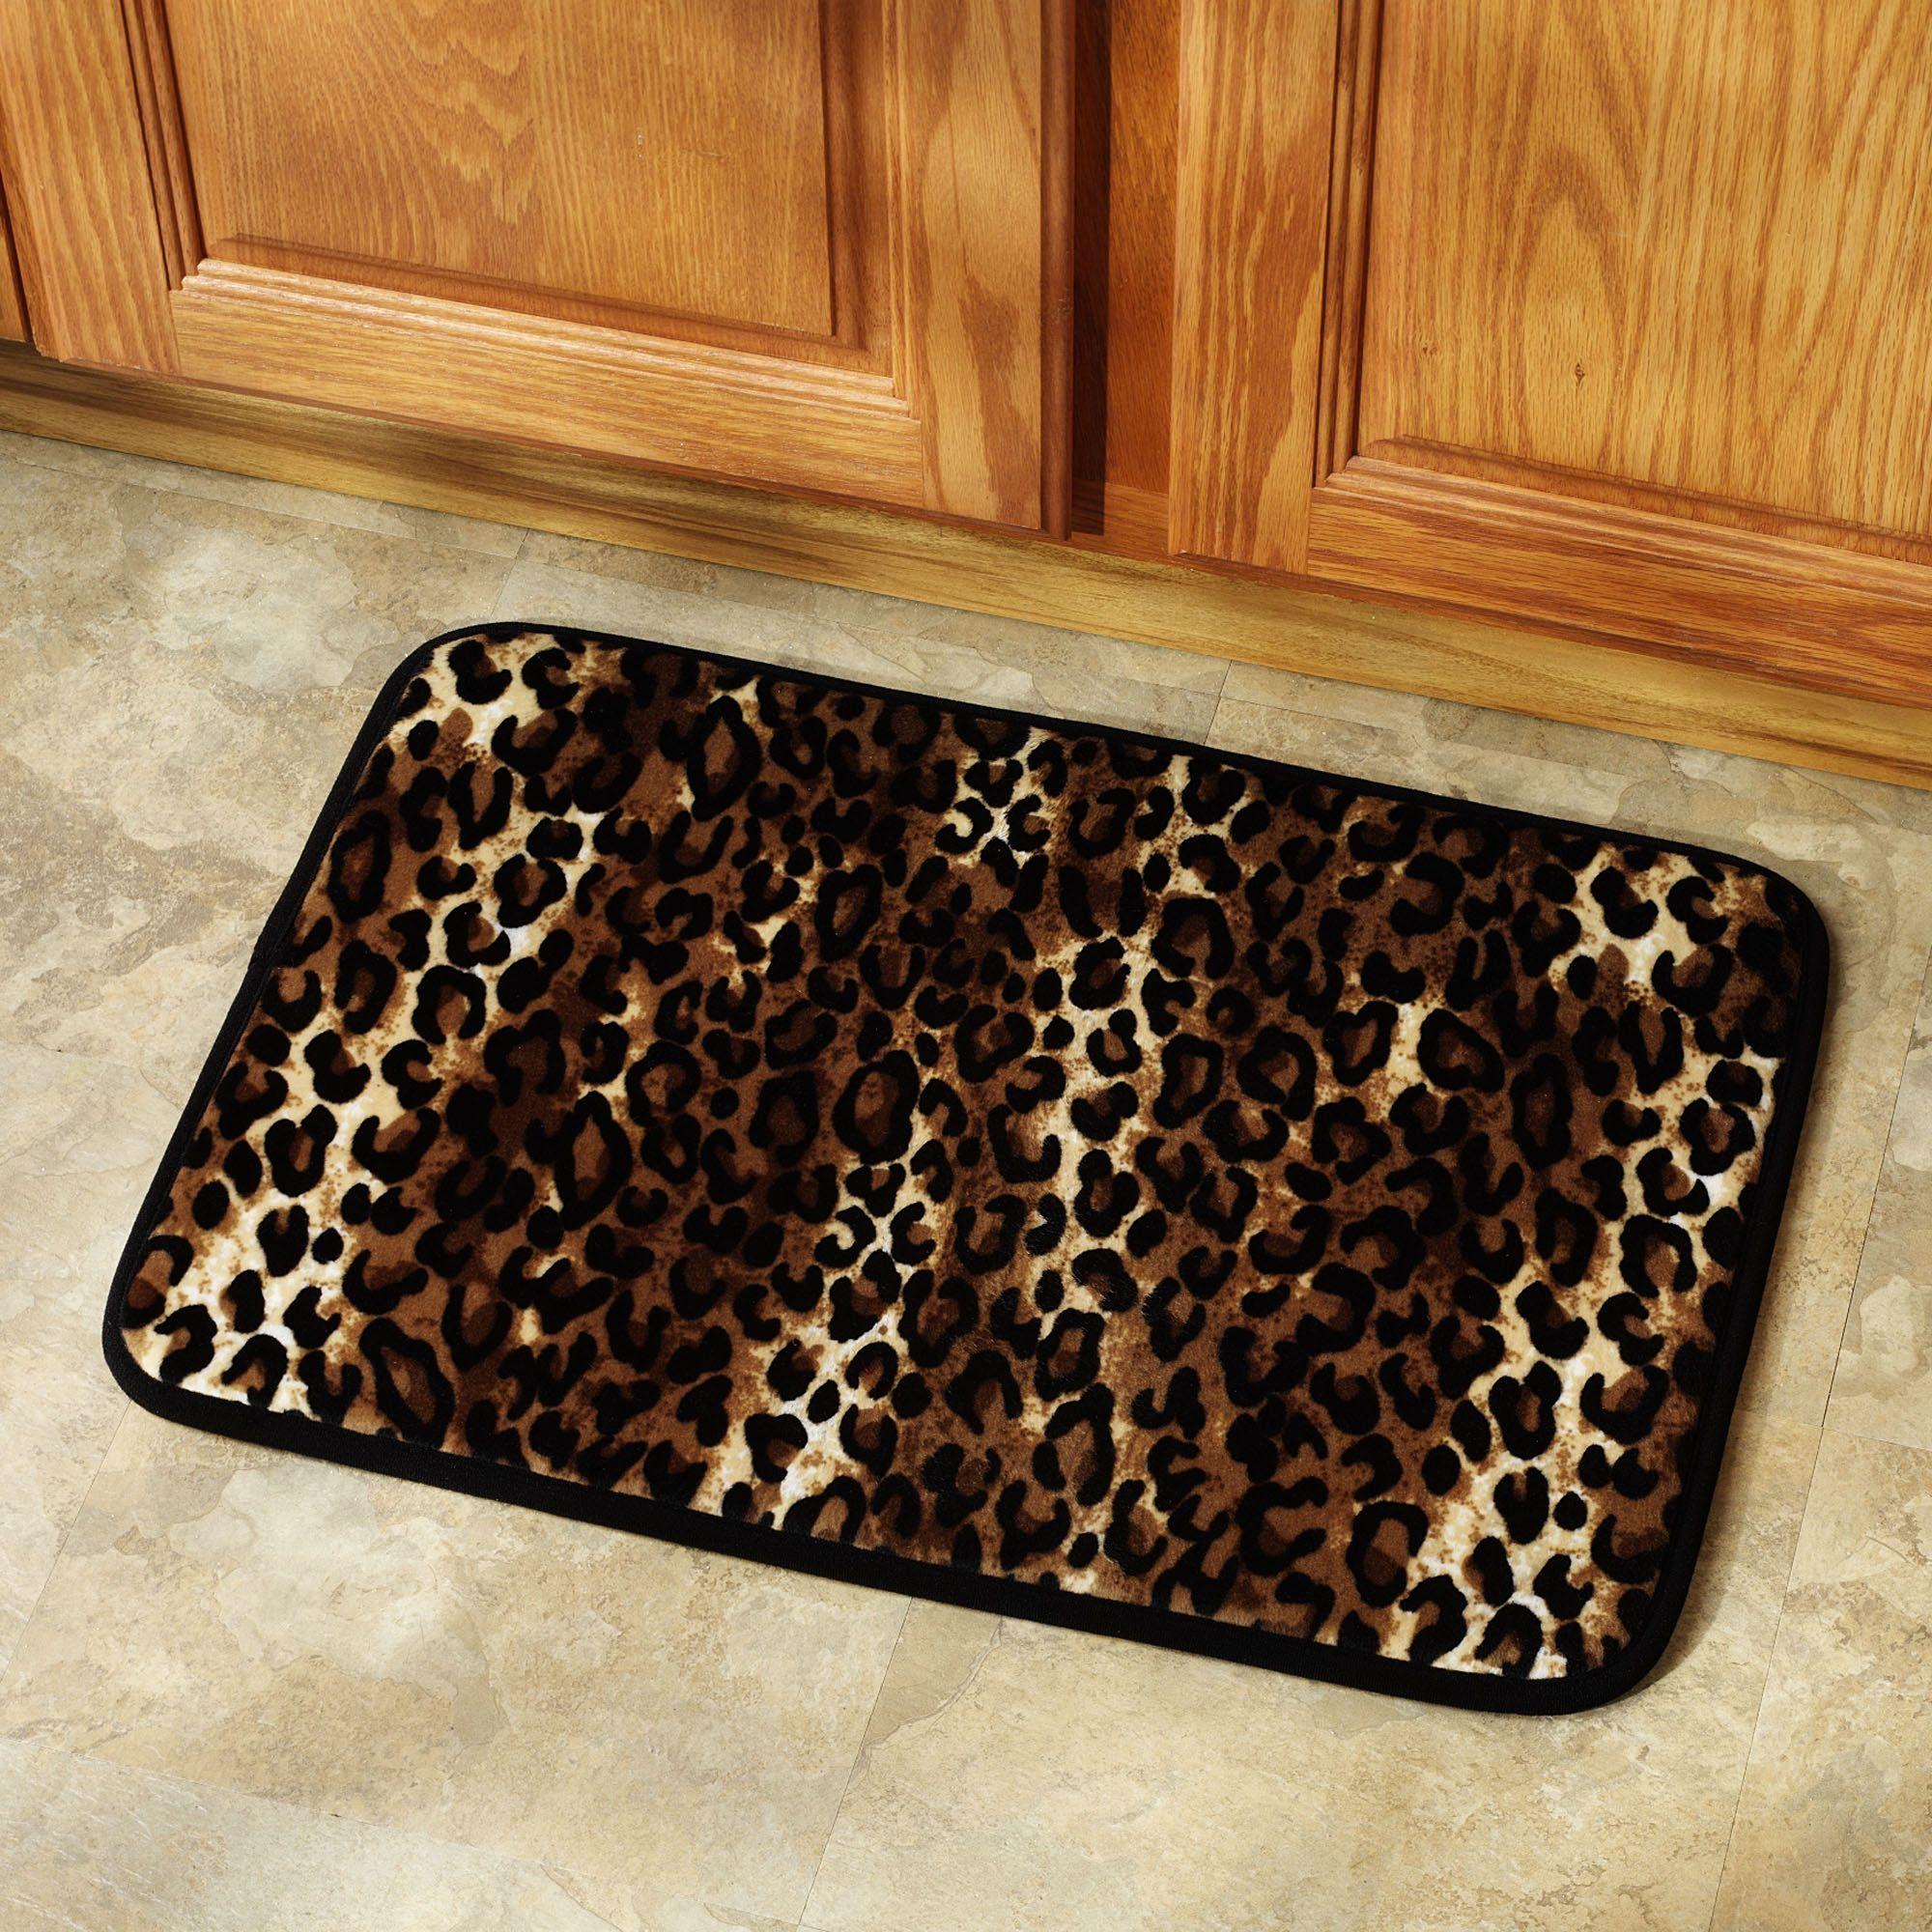 Bath Leopard Print